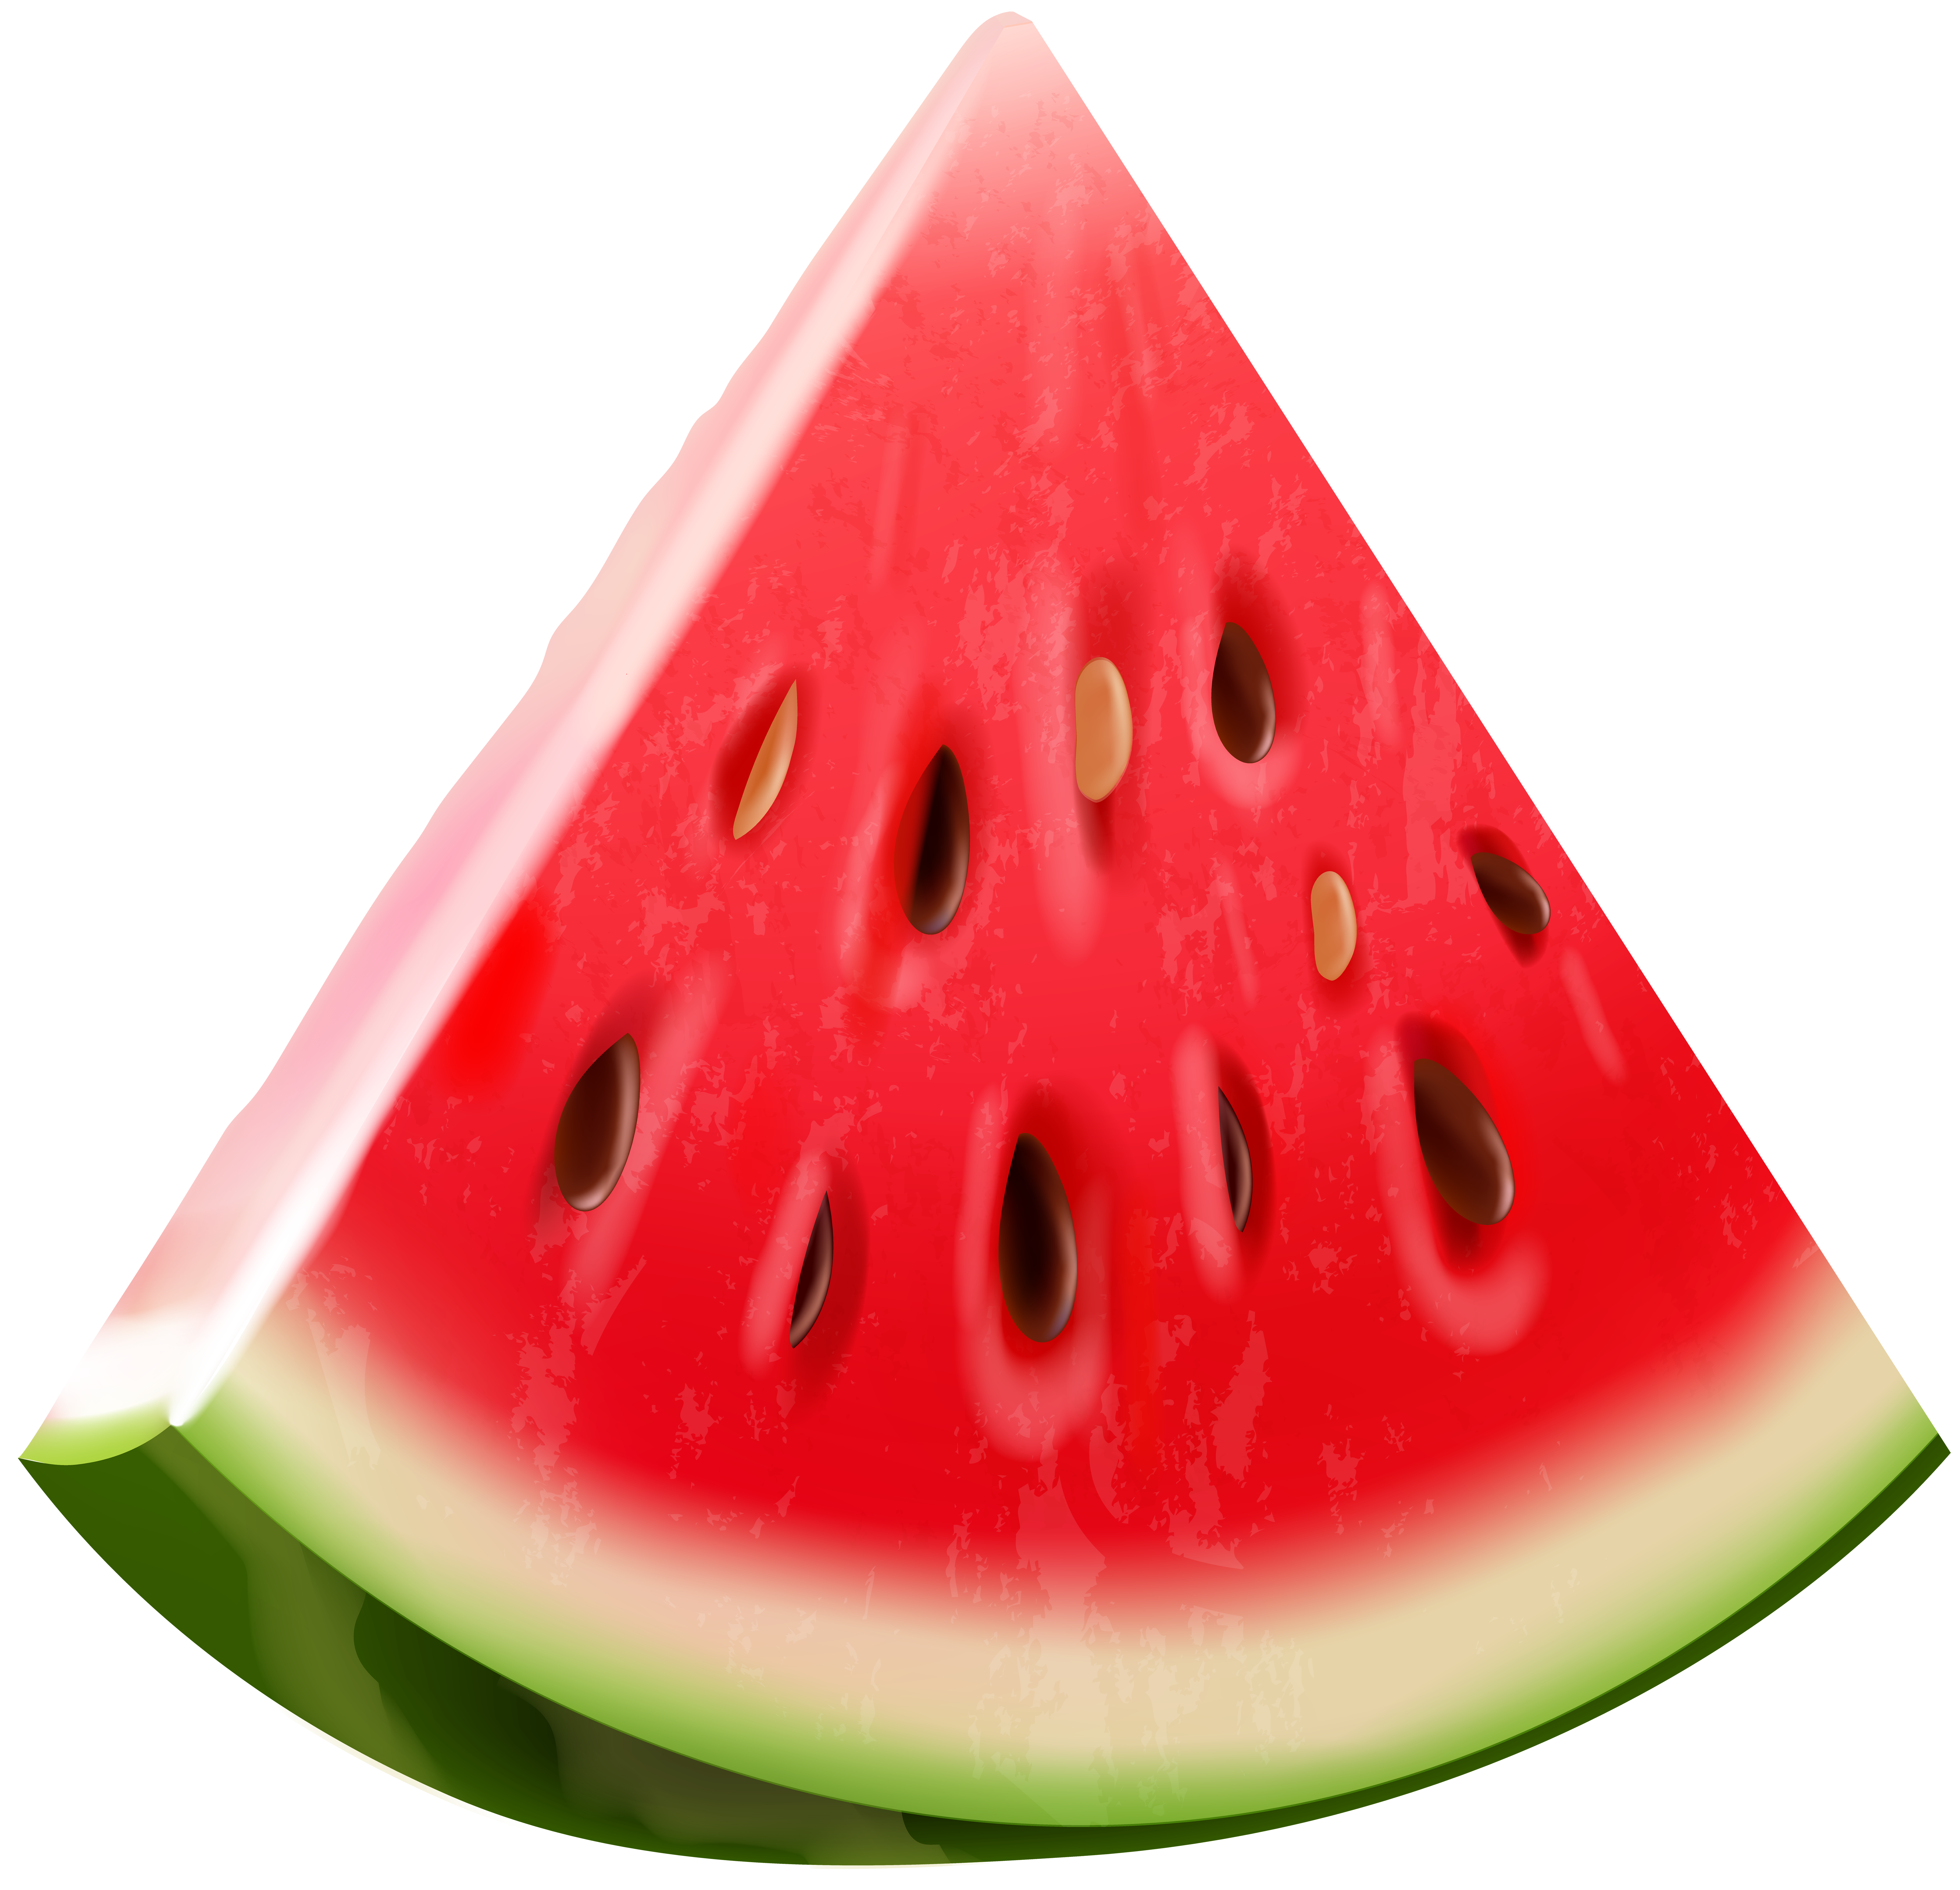 Watermelon transparent clipart banner transparent stock Watermelon Clip Art PNG Transparent Image | Gallery ... banner transparent stock